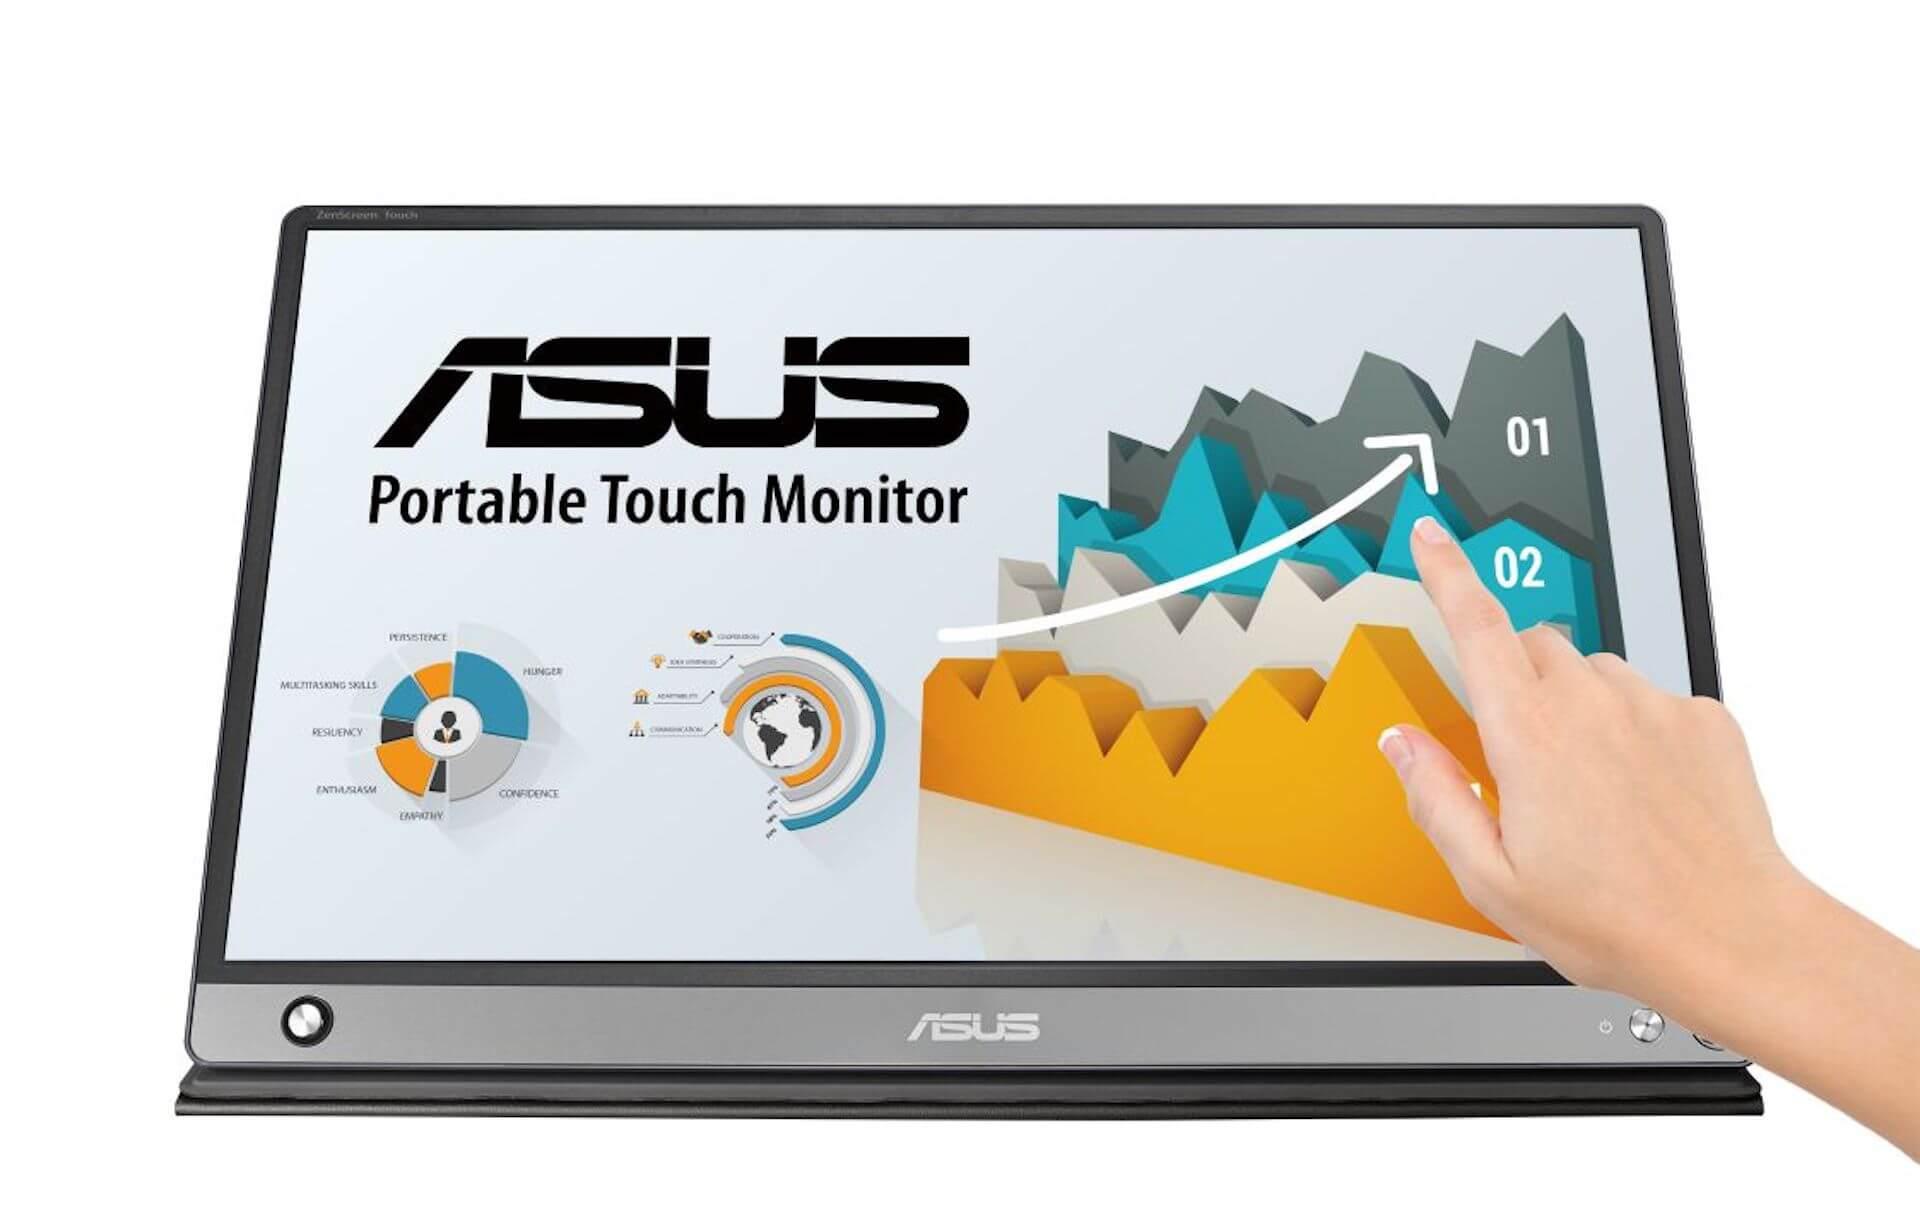 USB-C&micro HDMI端子搭載!わずか9mmの超薄型ディスプレイ2製品がASUSから登場 tech190918_asus_display_5